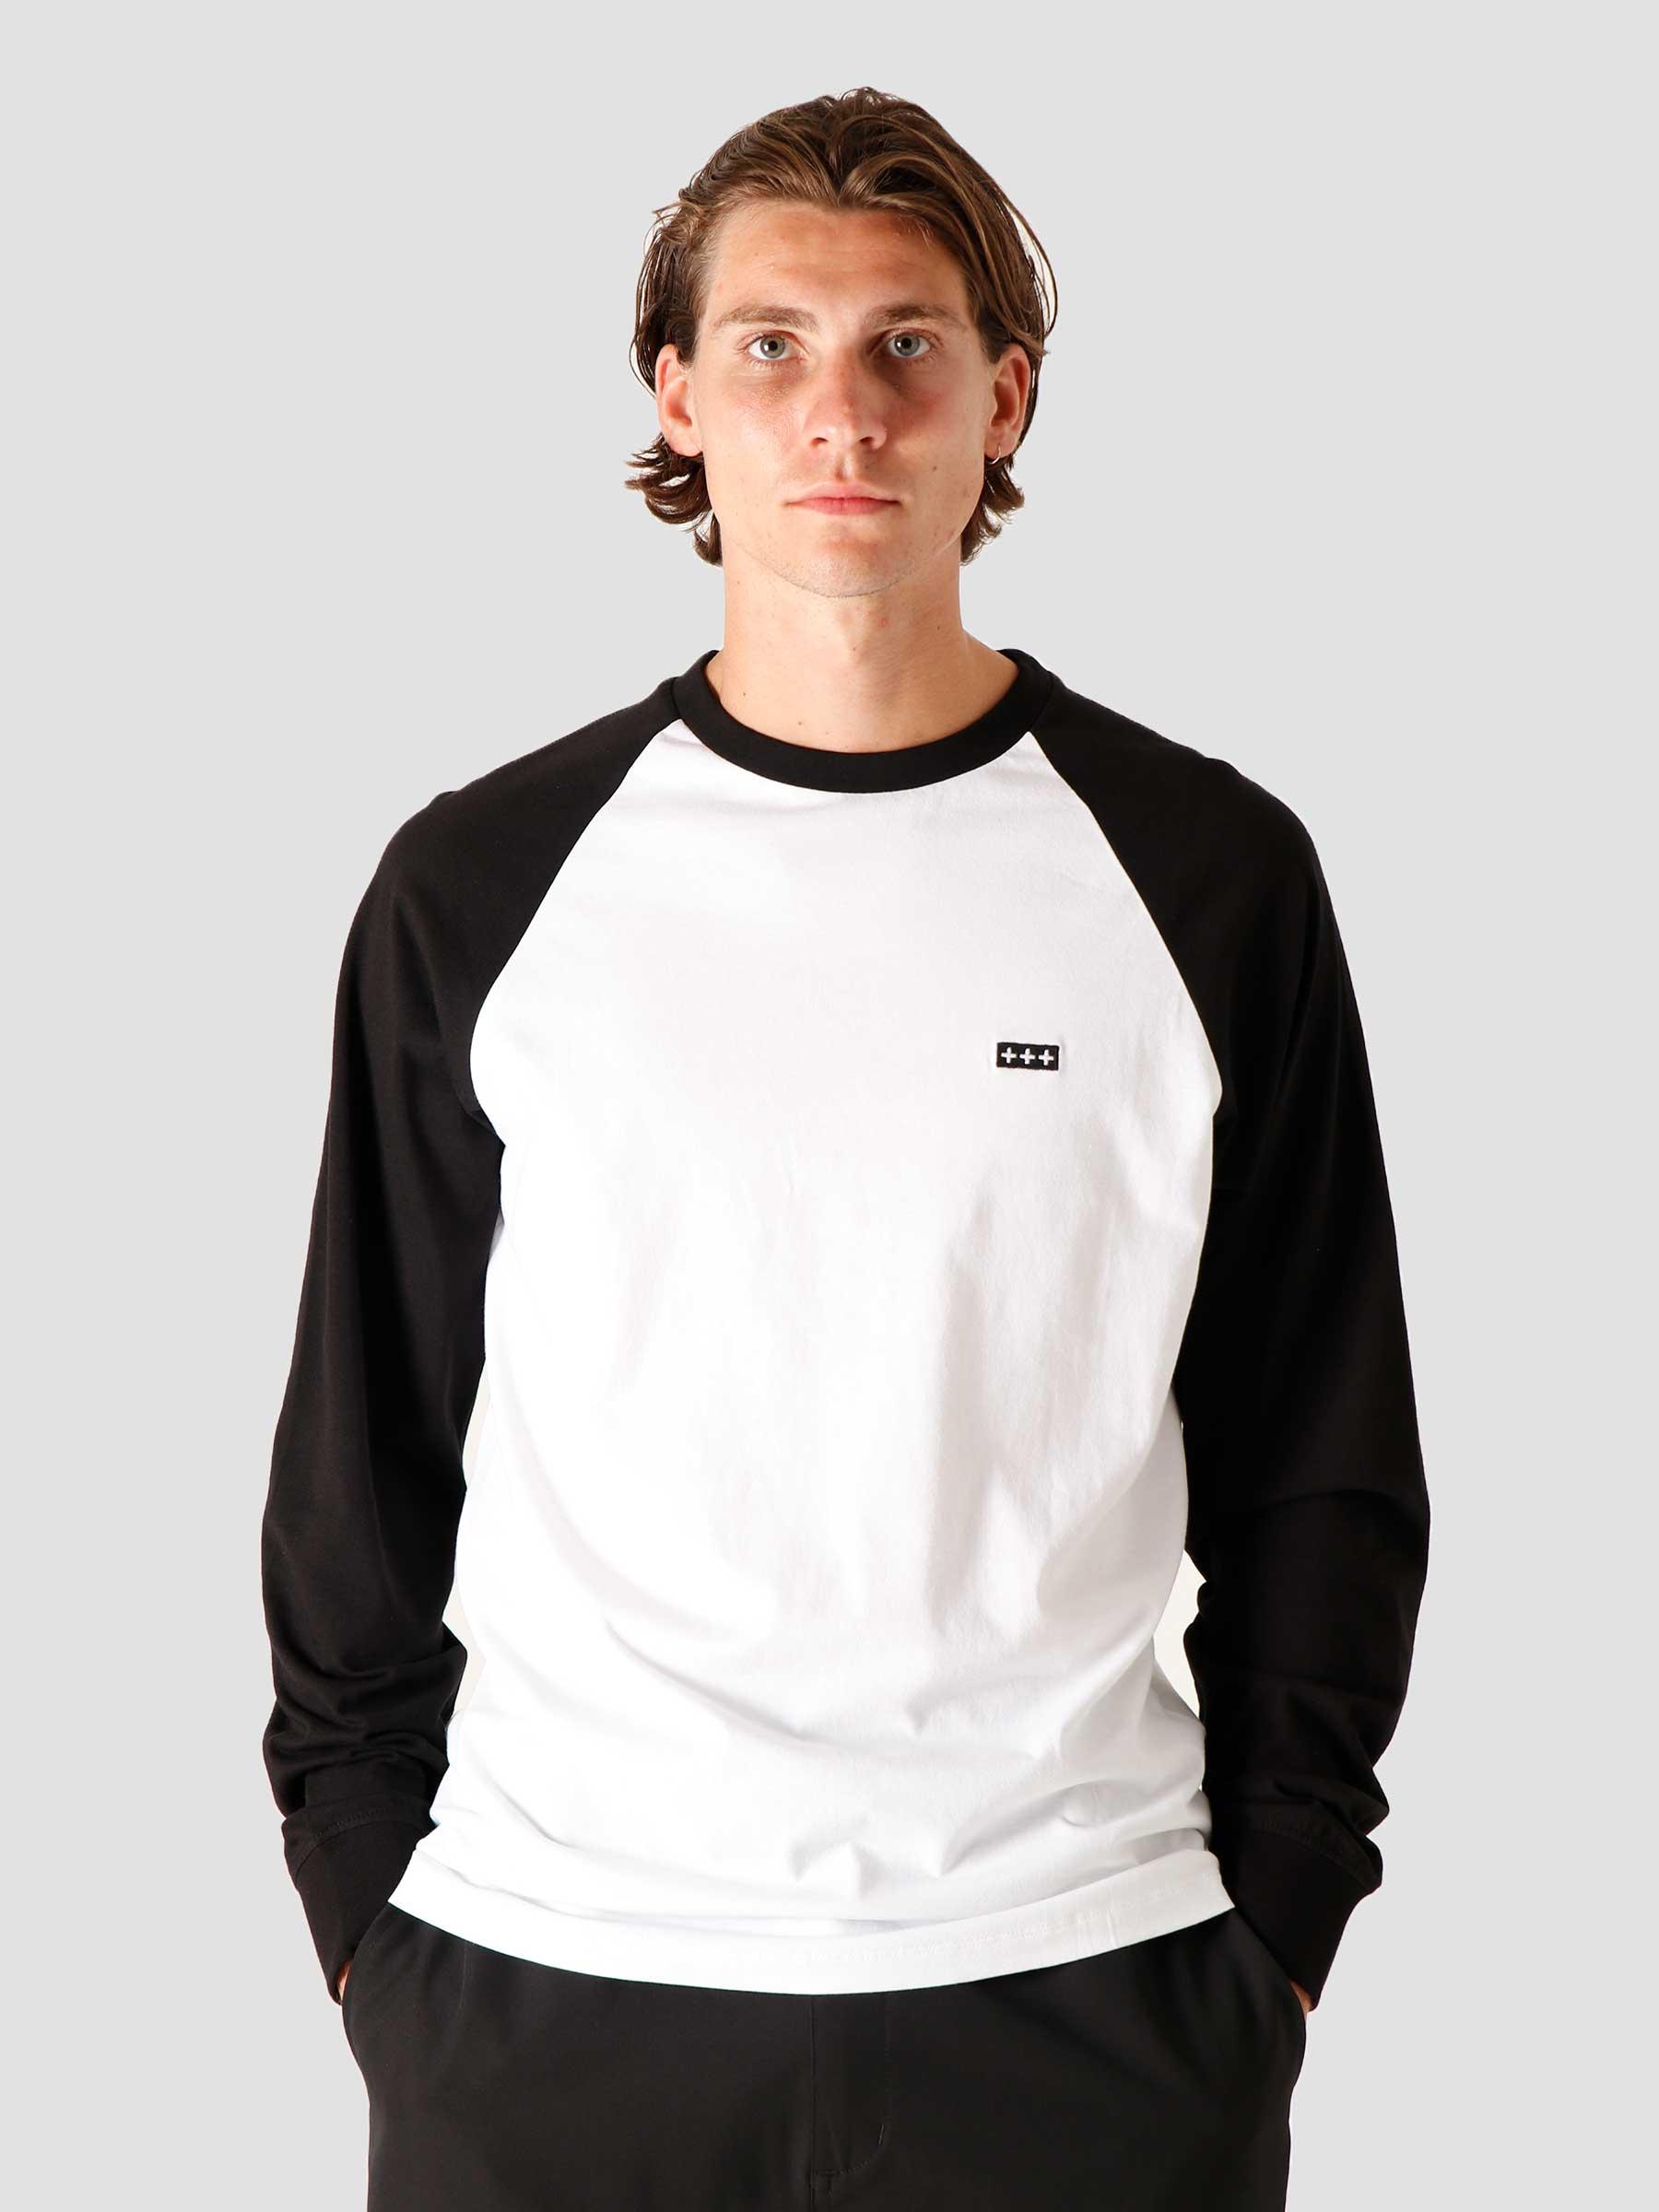 QB09 Patch Logo BB Longsleeve Black/White